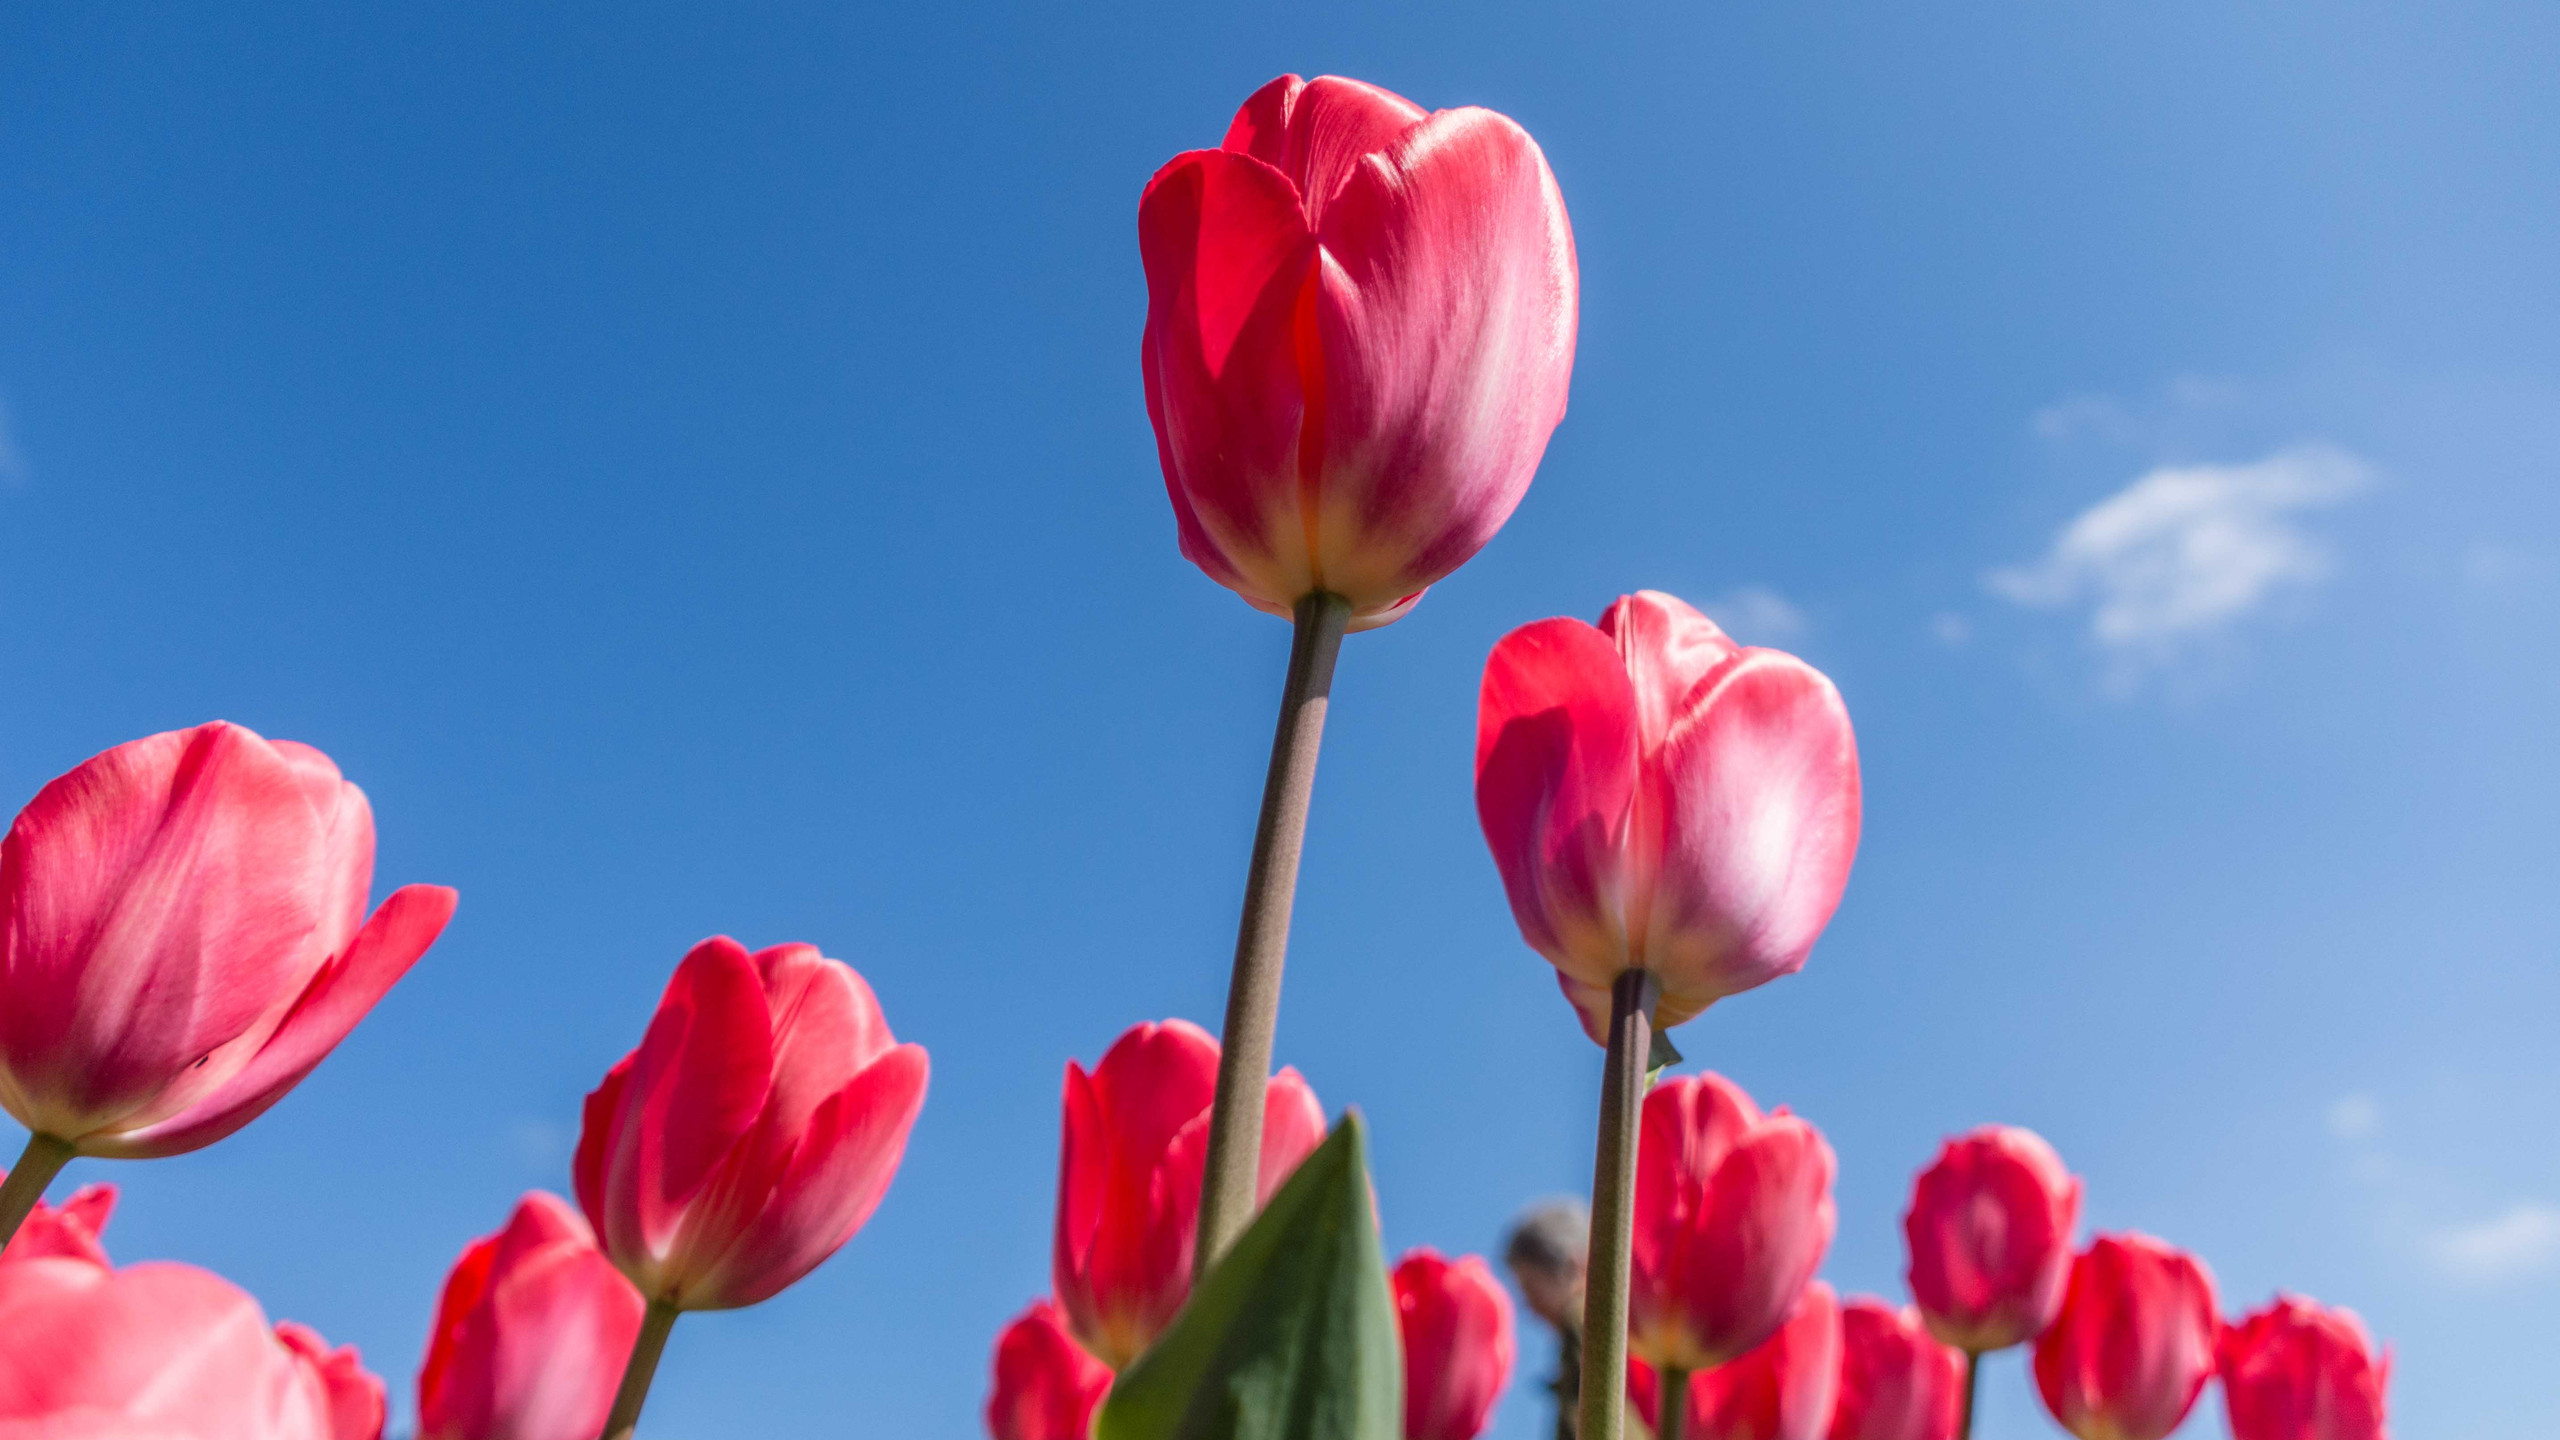 Daffodils (7 of 8)